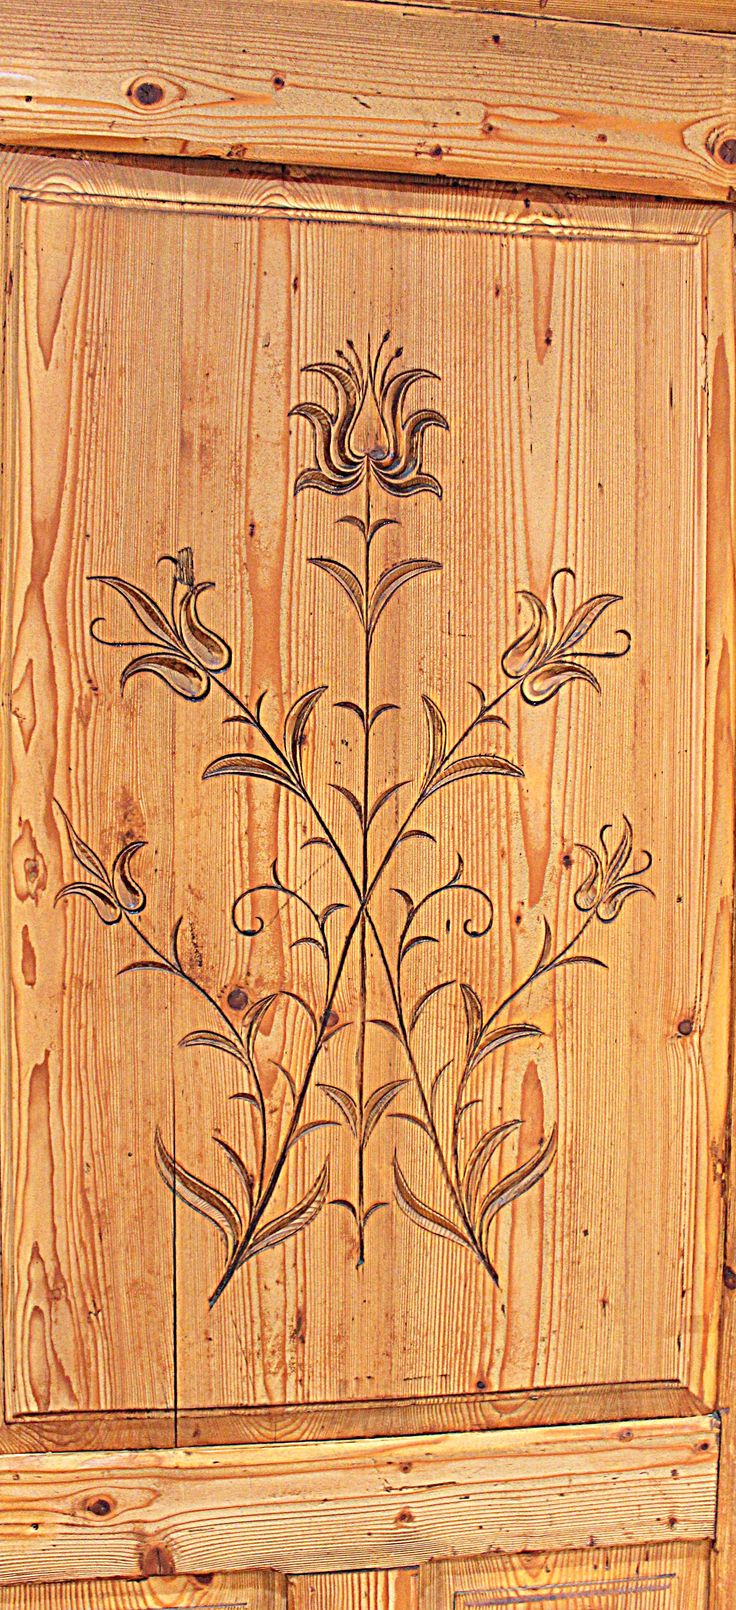 Traditional Zakopane architecture and design, Zakopane, Poland www.travellinghistory.com